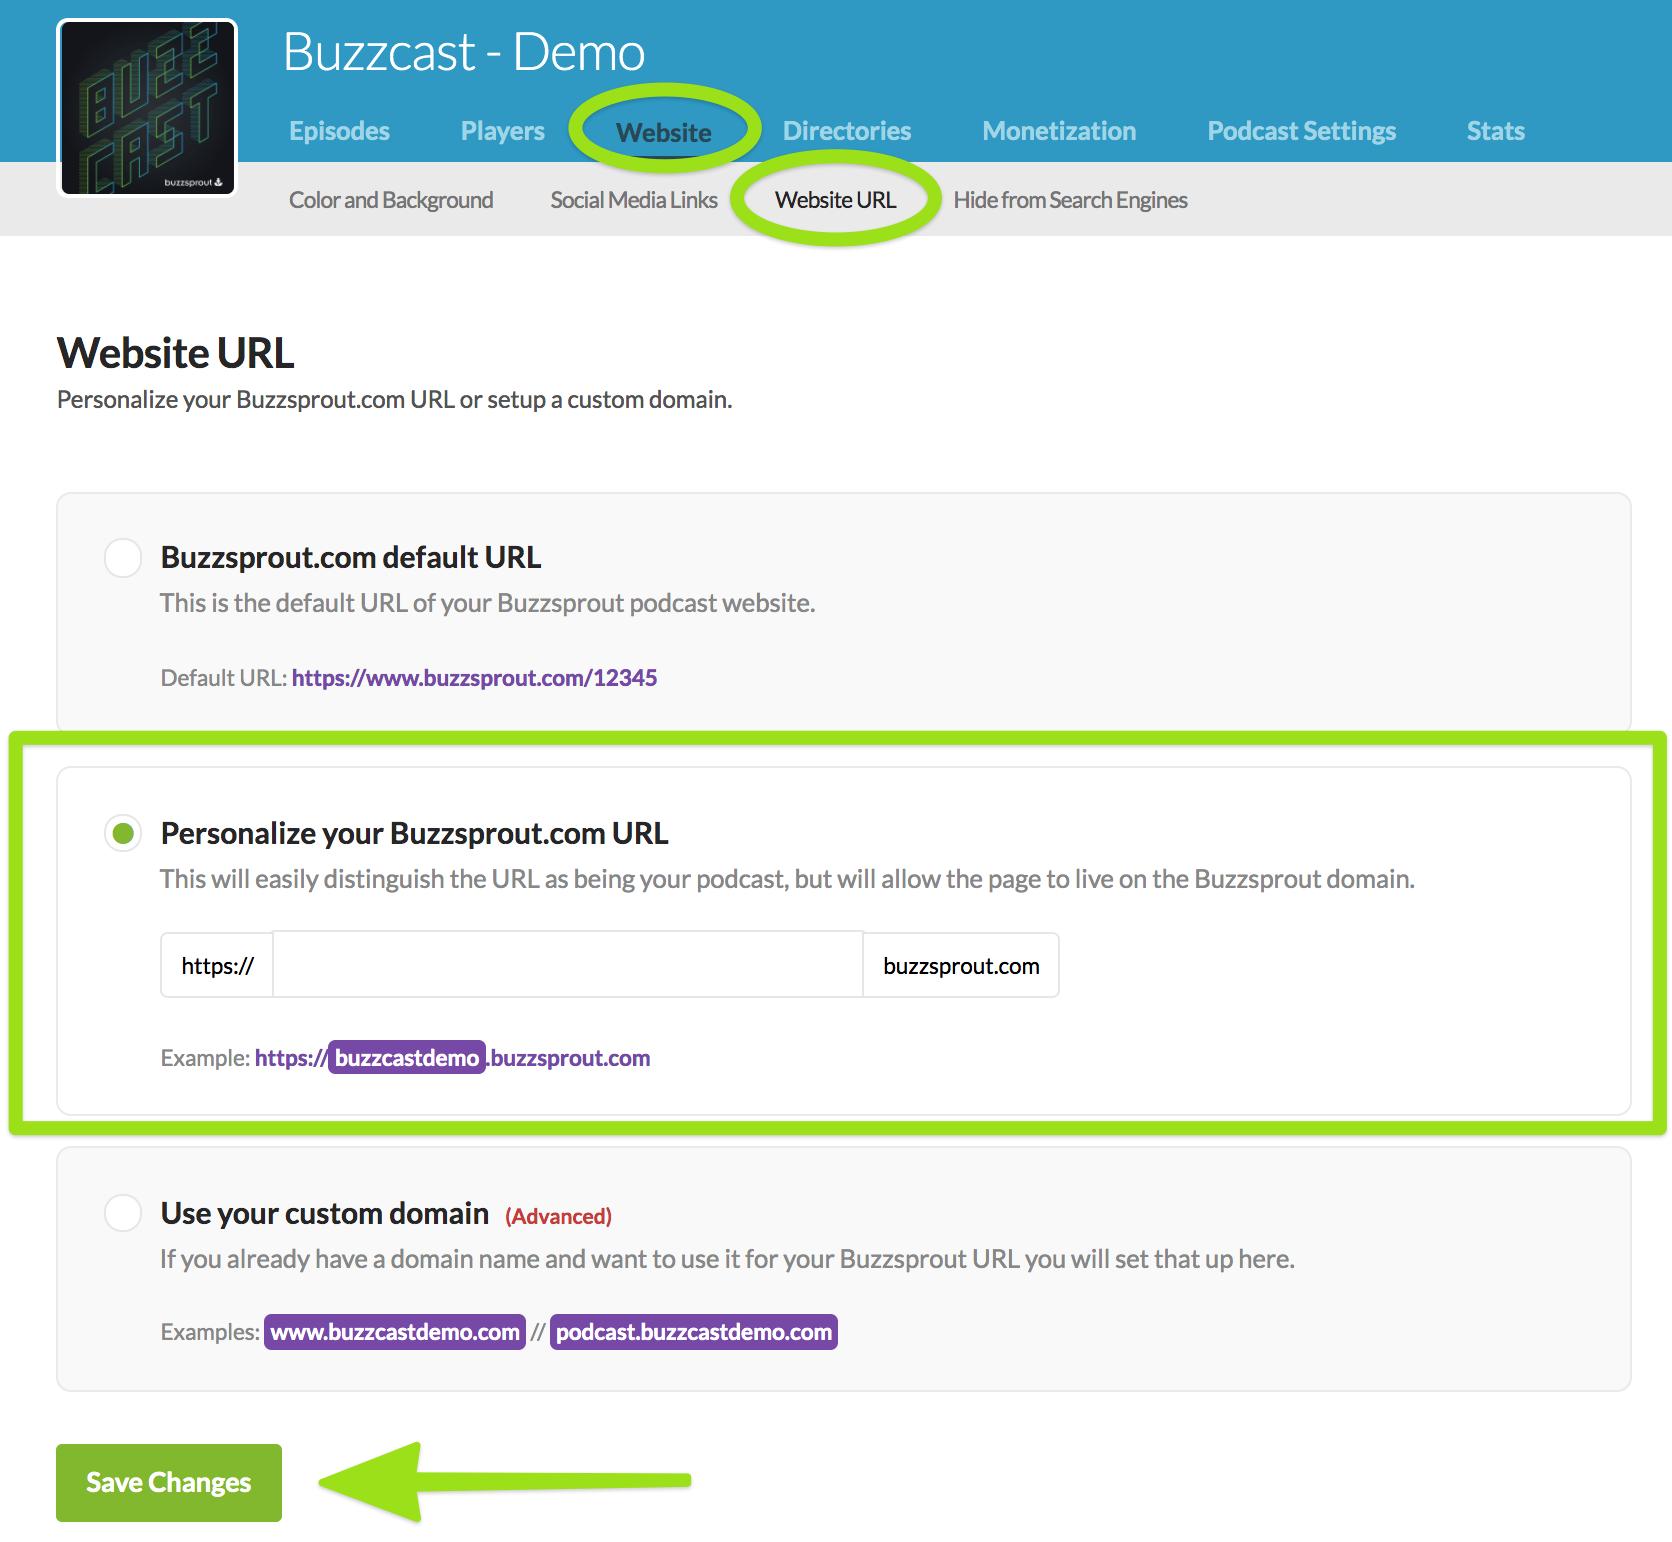 Screenshot of website url page, highlighting personalized URL field